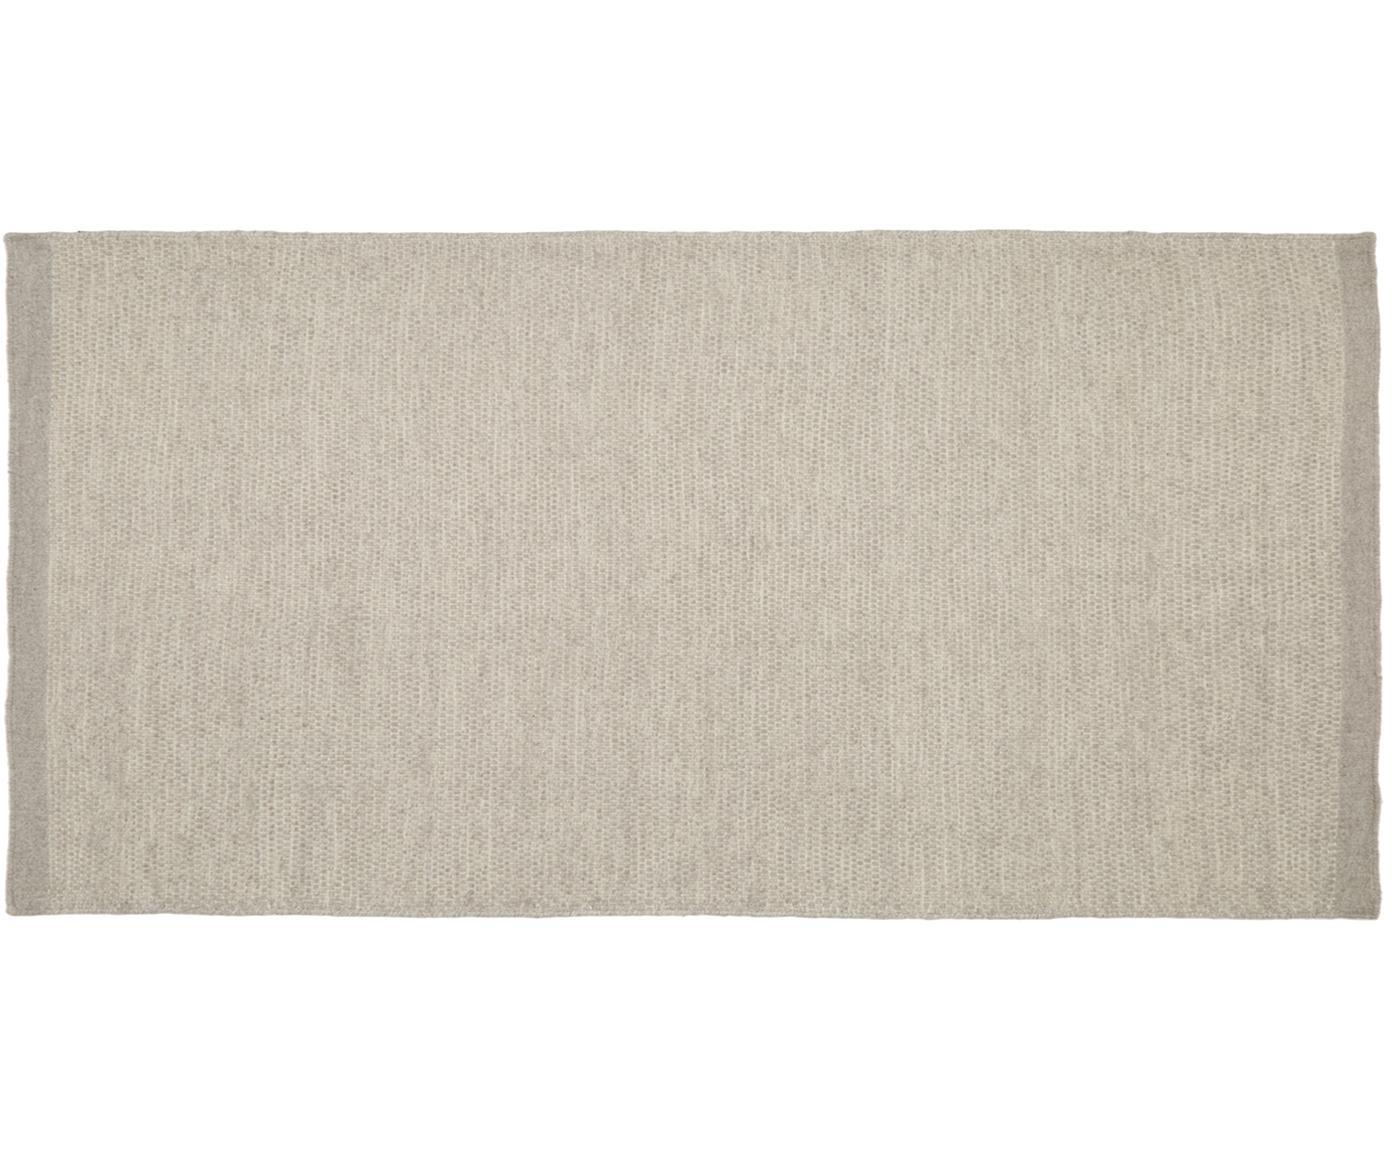 Alfombra kilim artesanal de lana Delight, Gris claro, An 70 x L 140 cm (Tamaño XS)